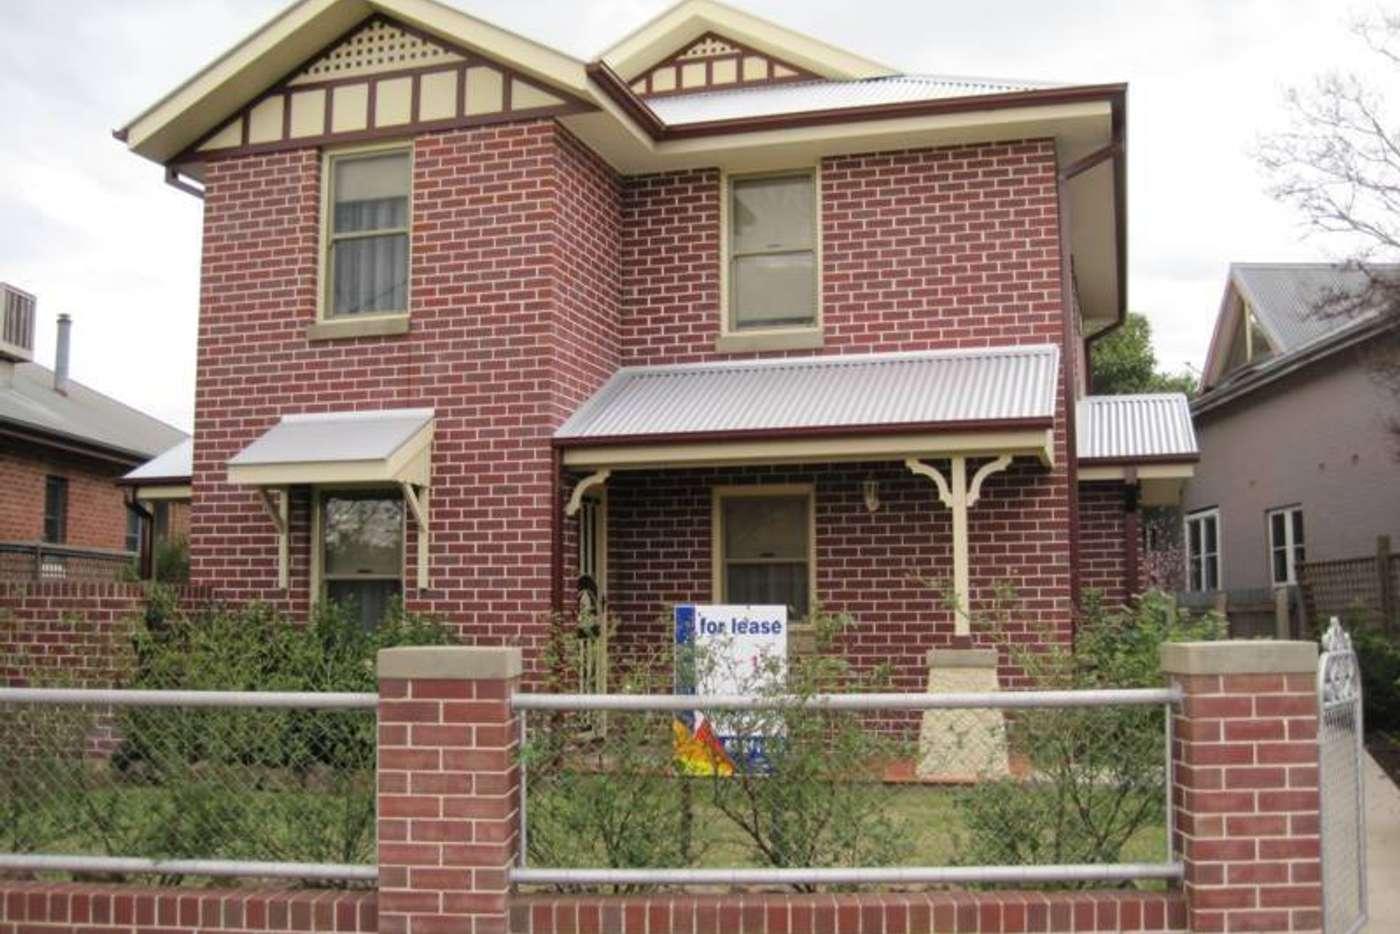 Main view of Homely unit listing, 1/79 Tarcutta Street, Wagga Wagga NSW 2650